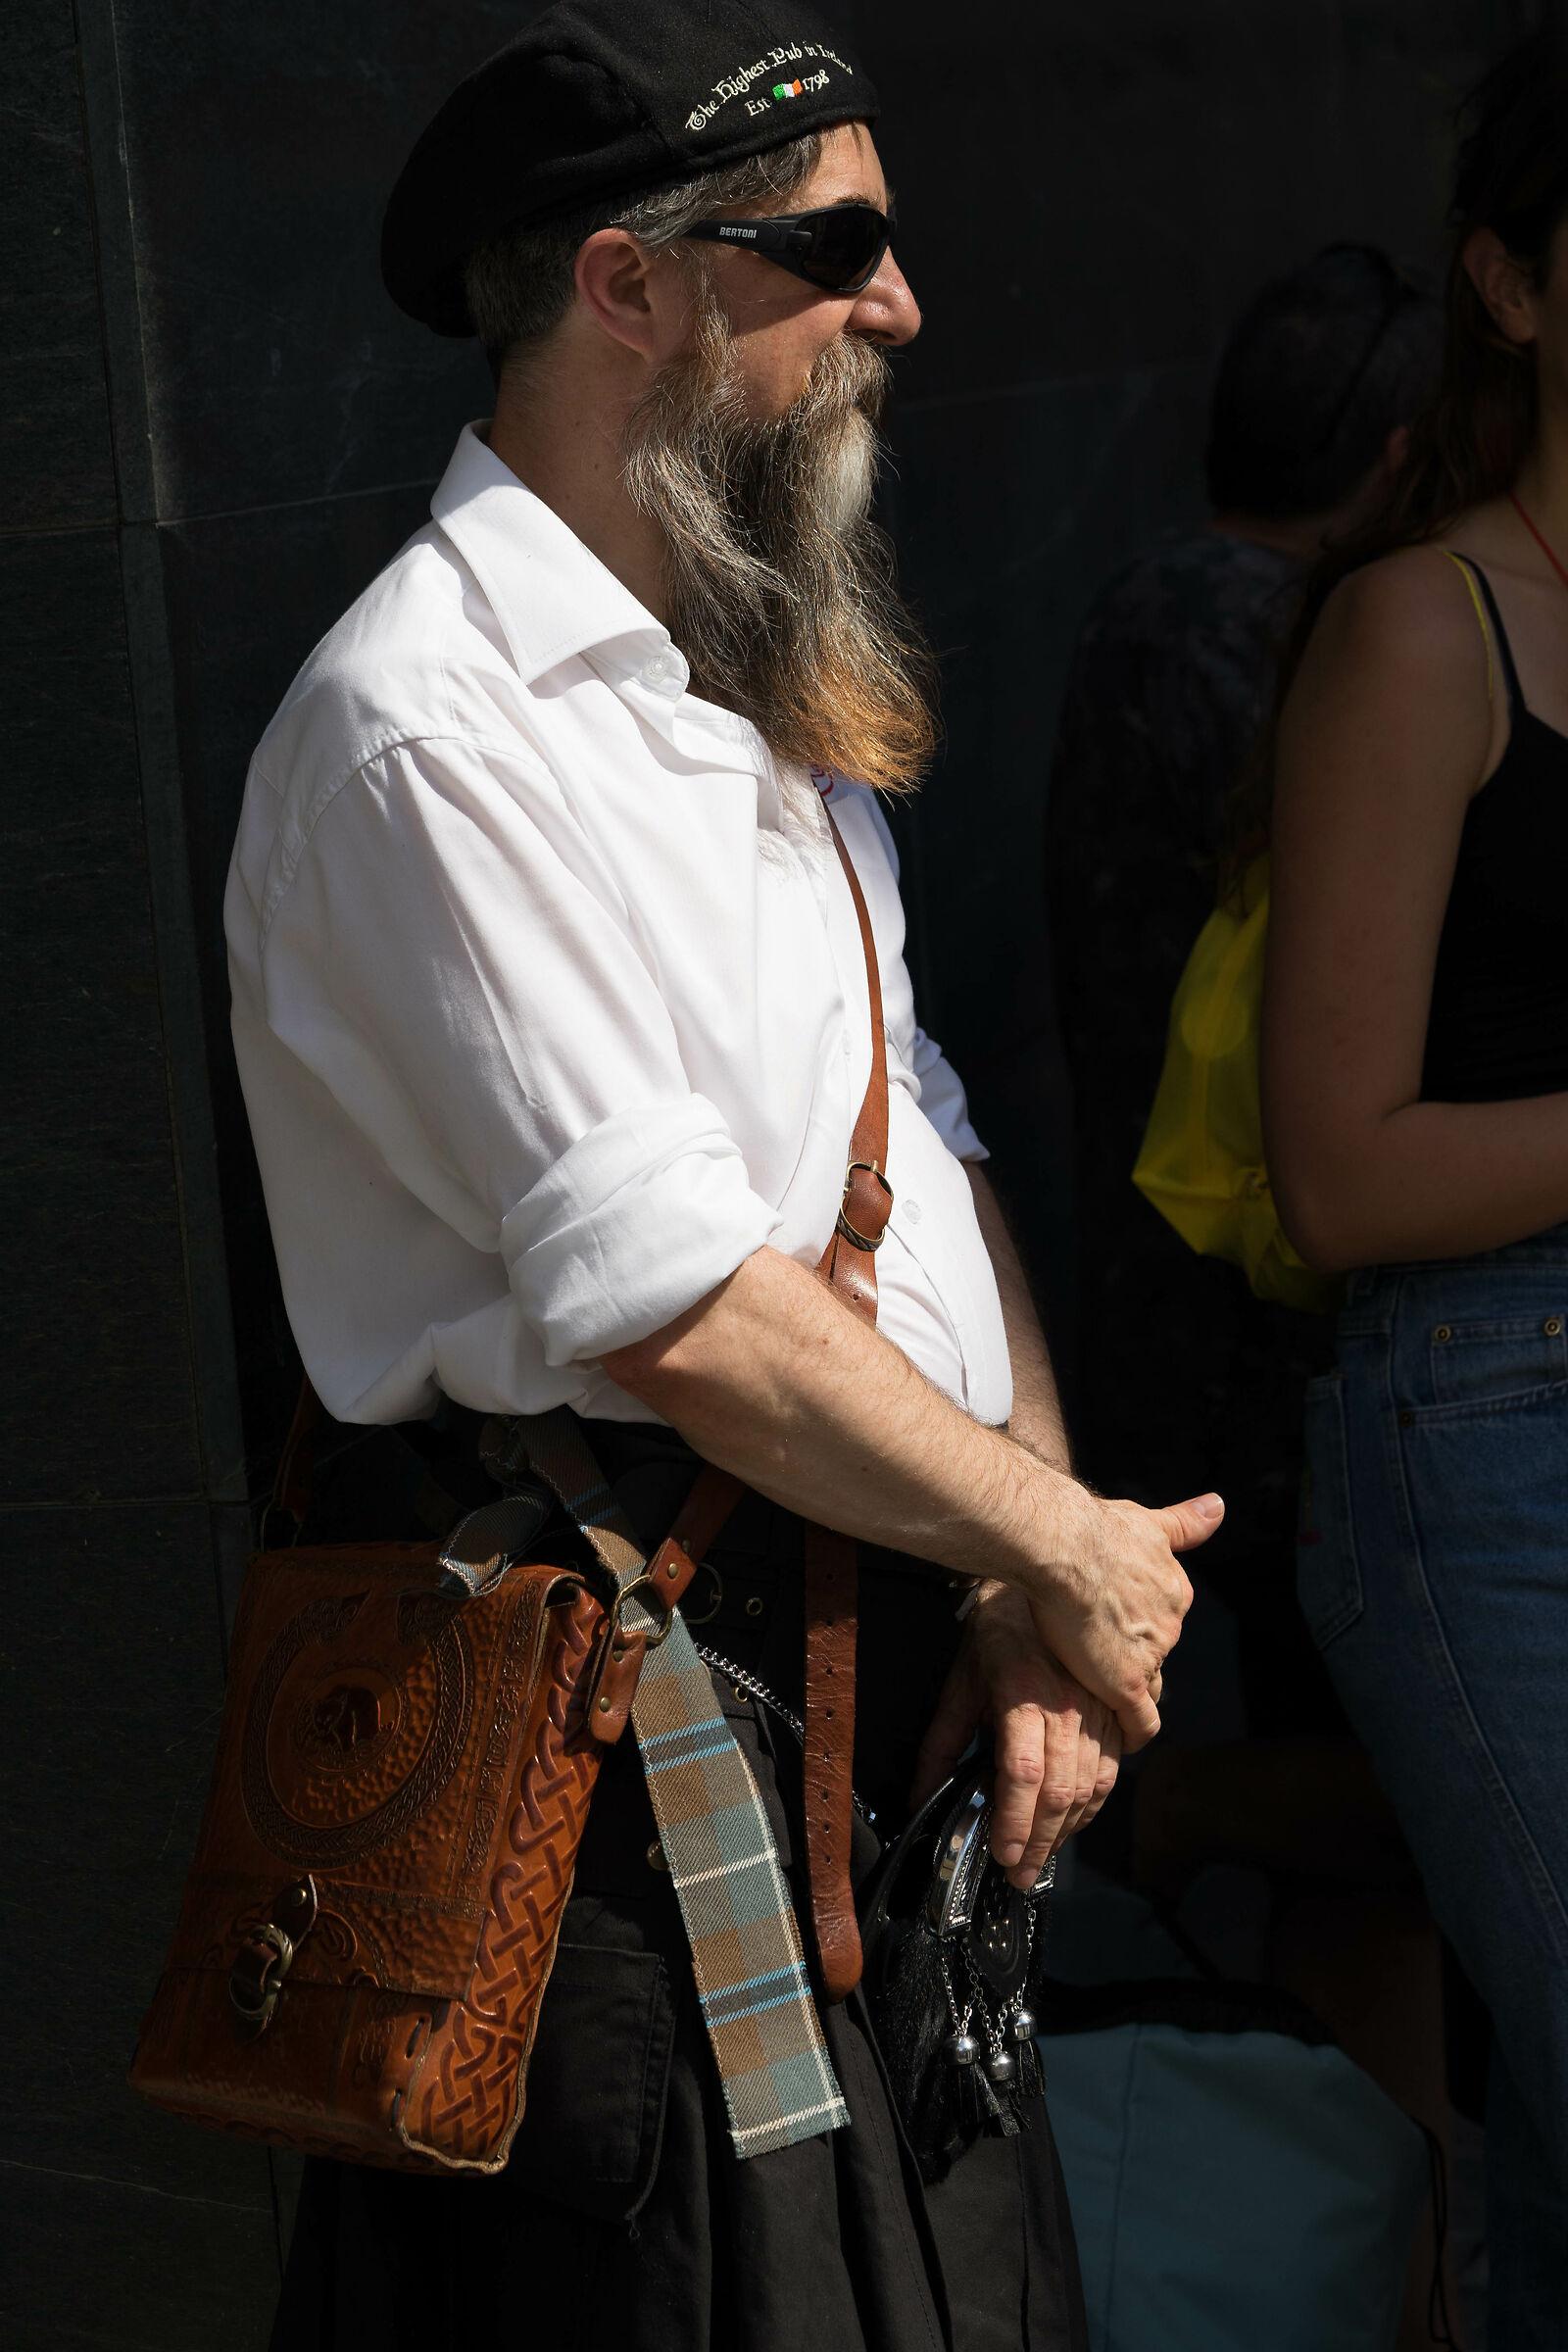 Celtic beard...